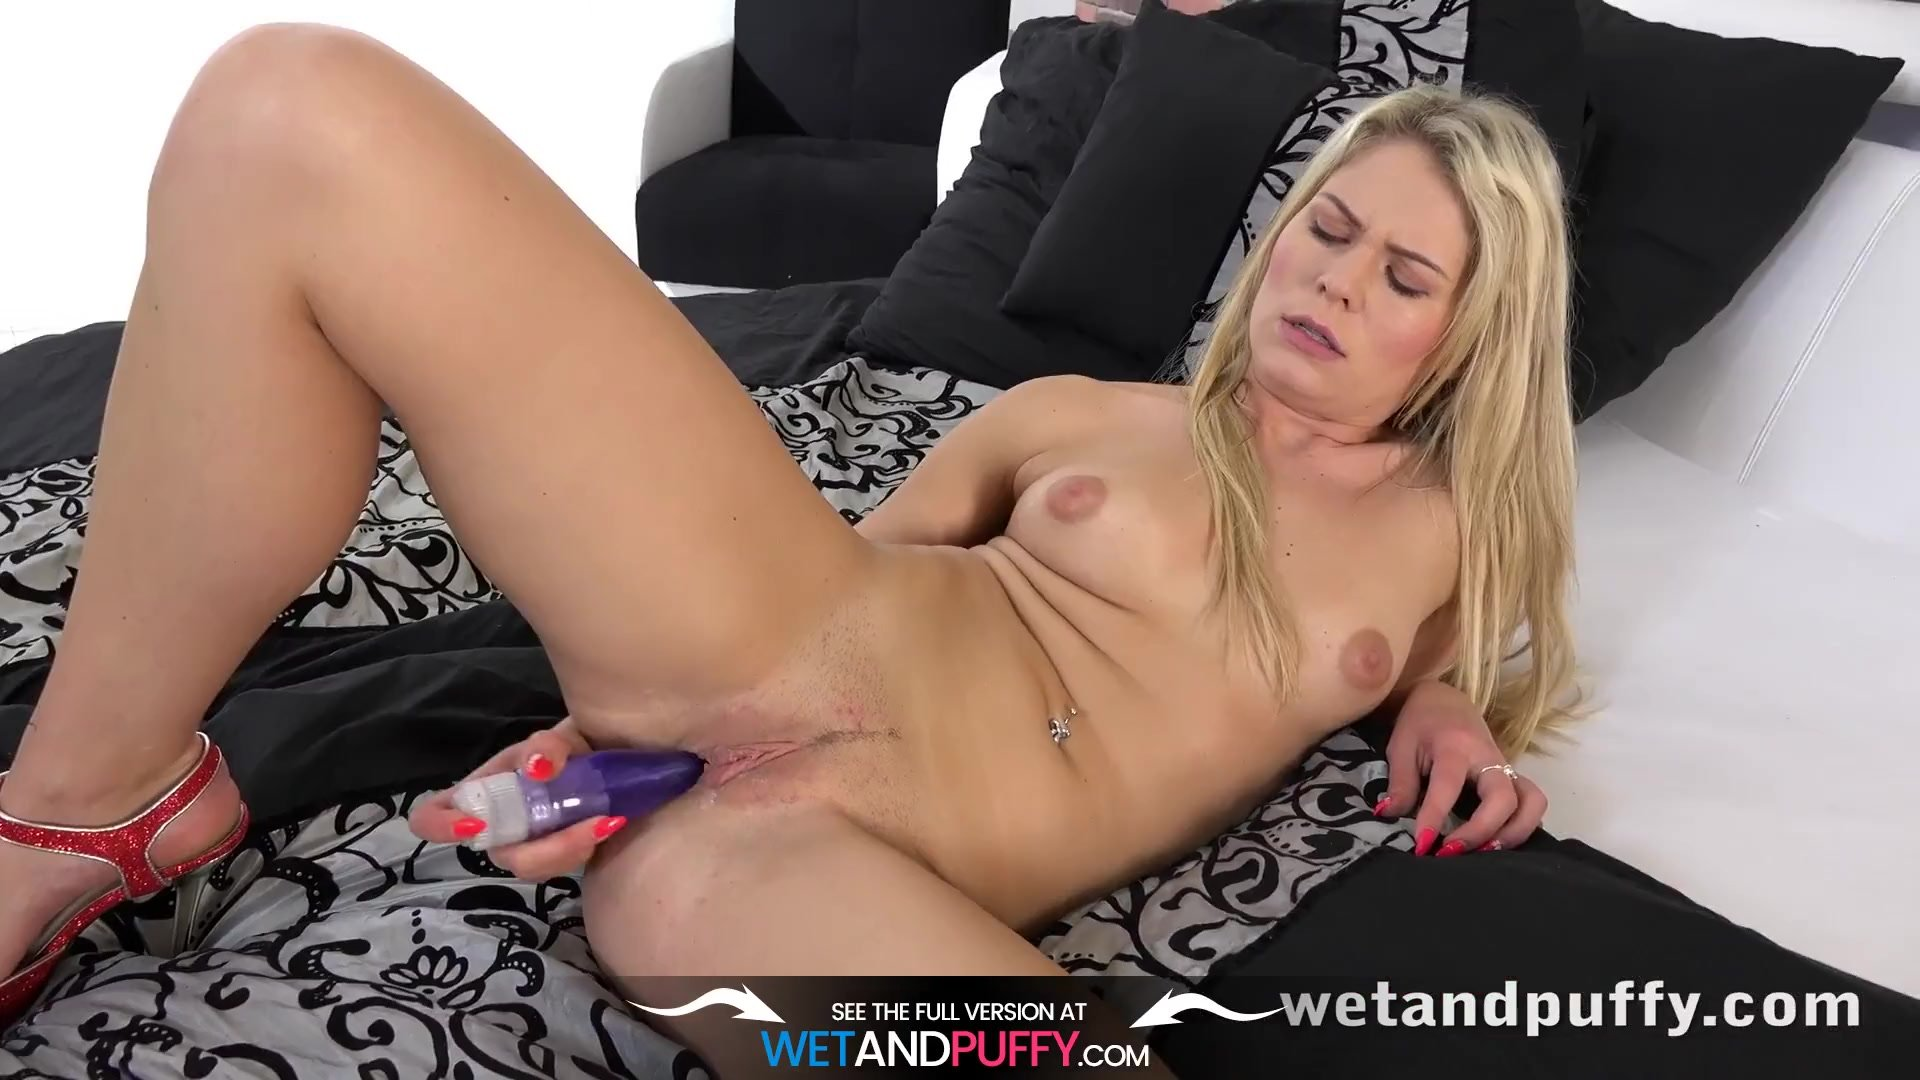 Czech/girls masturbating/her lips claudia orgasming macc